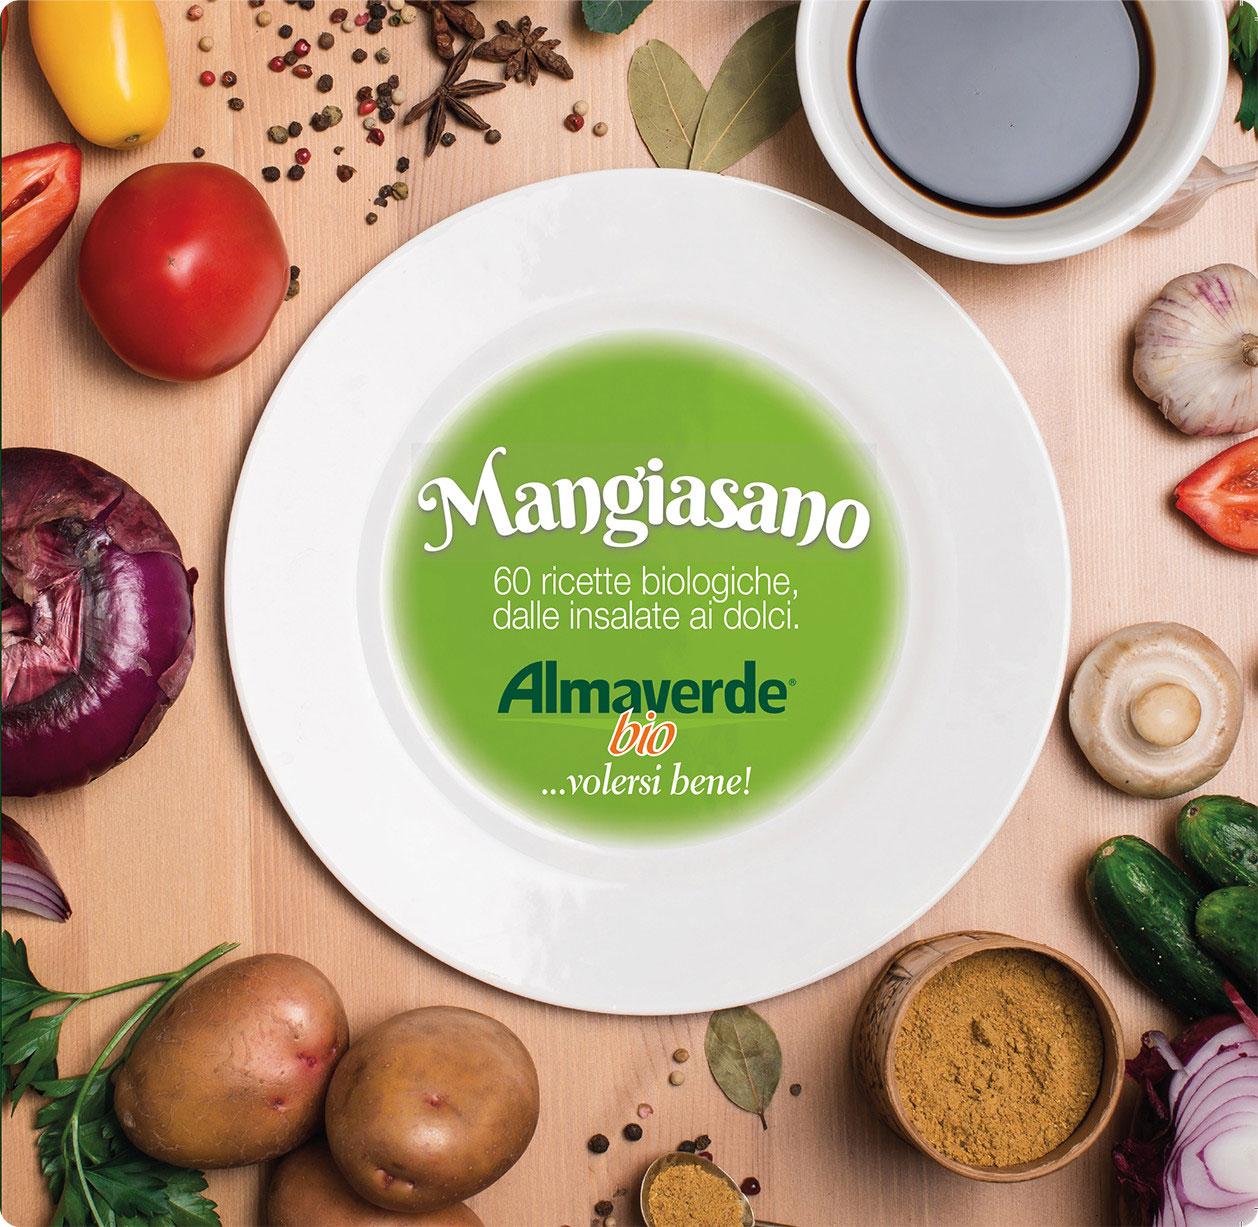 Mangiasano Almaverde Bio